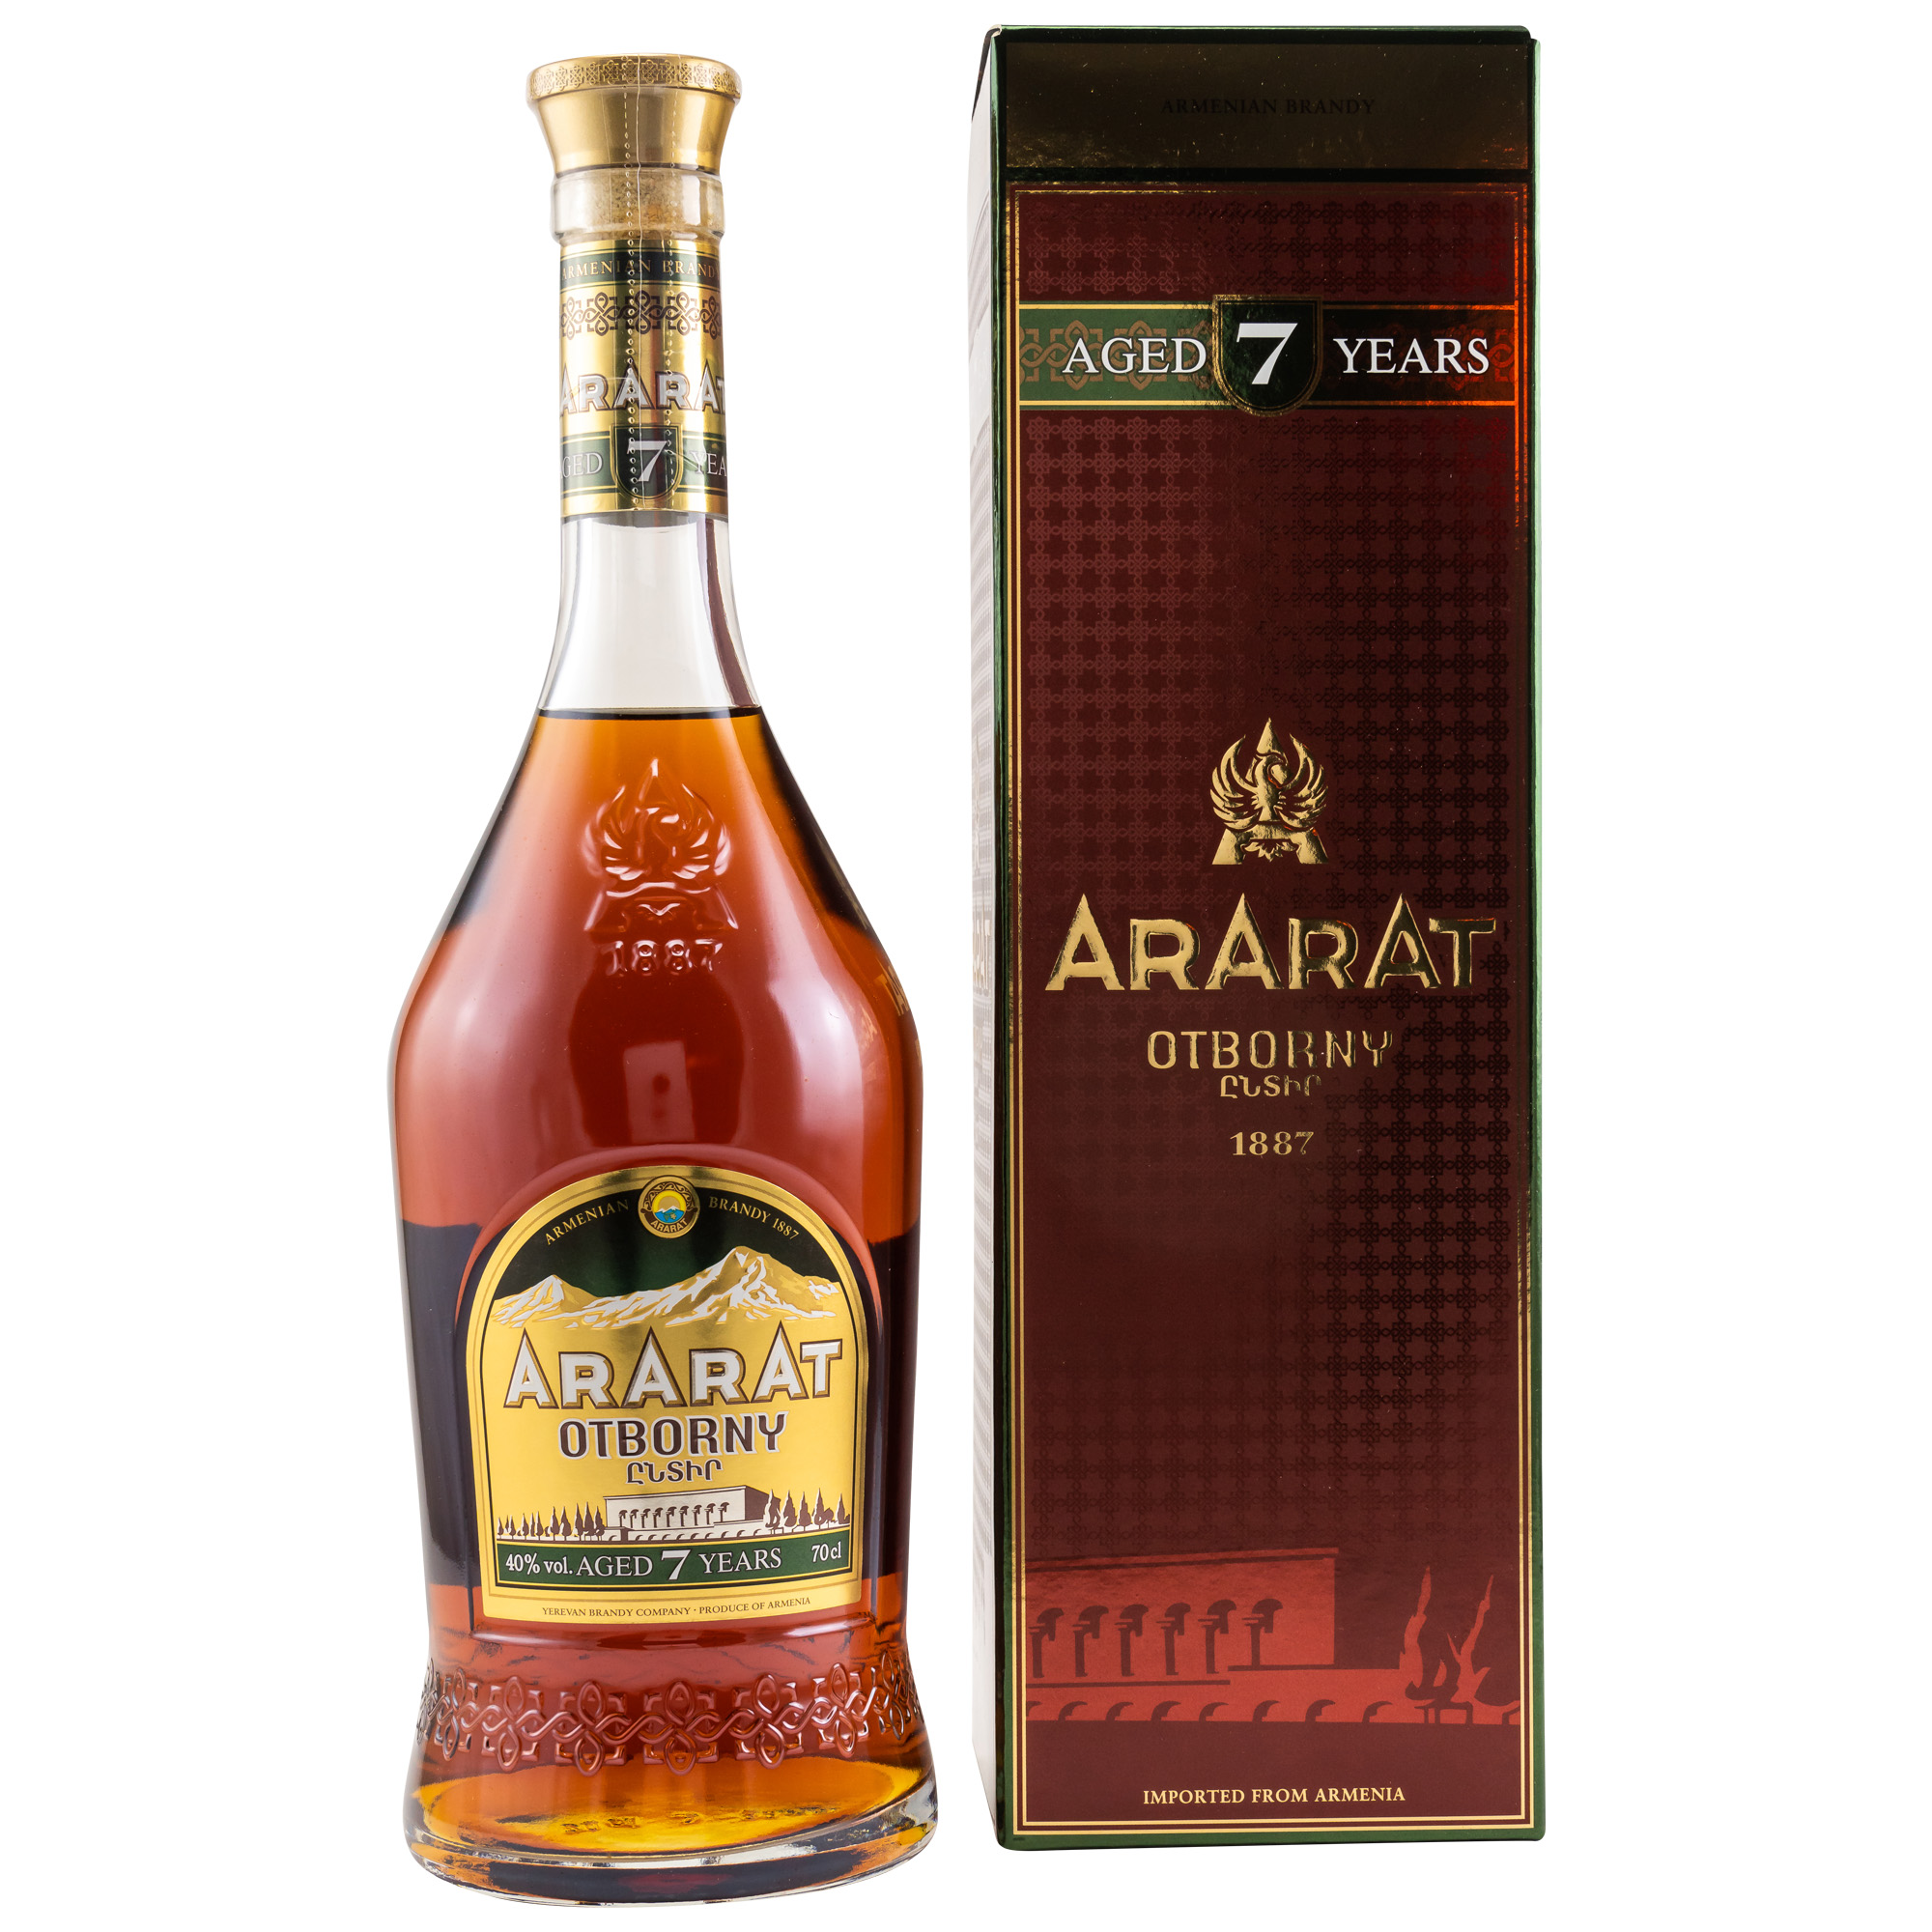 Ararat Brandy Otborny 7 y. - 40% vol.